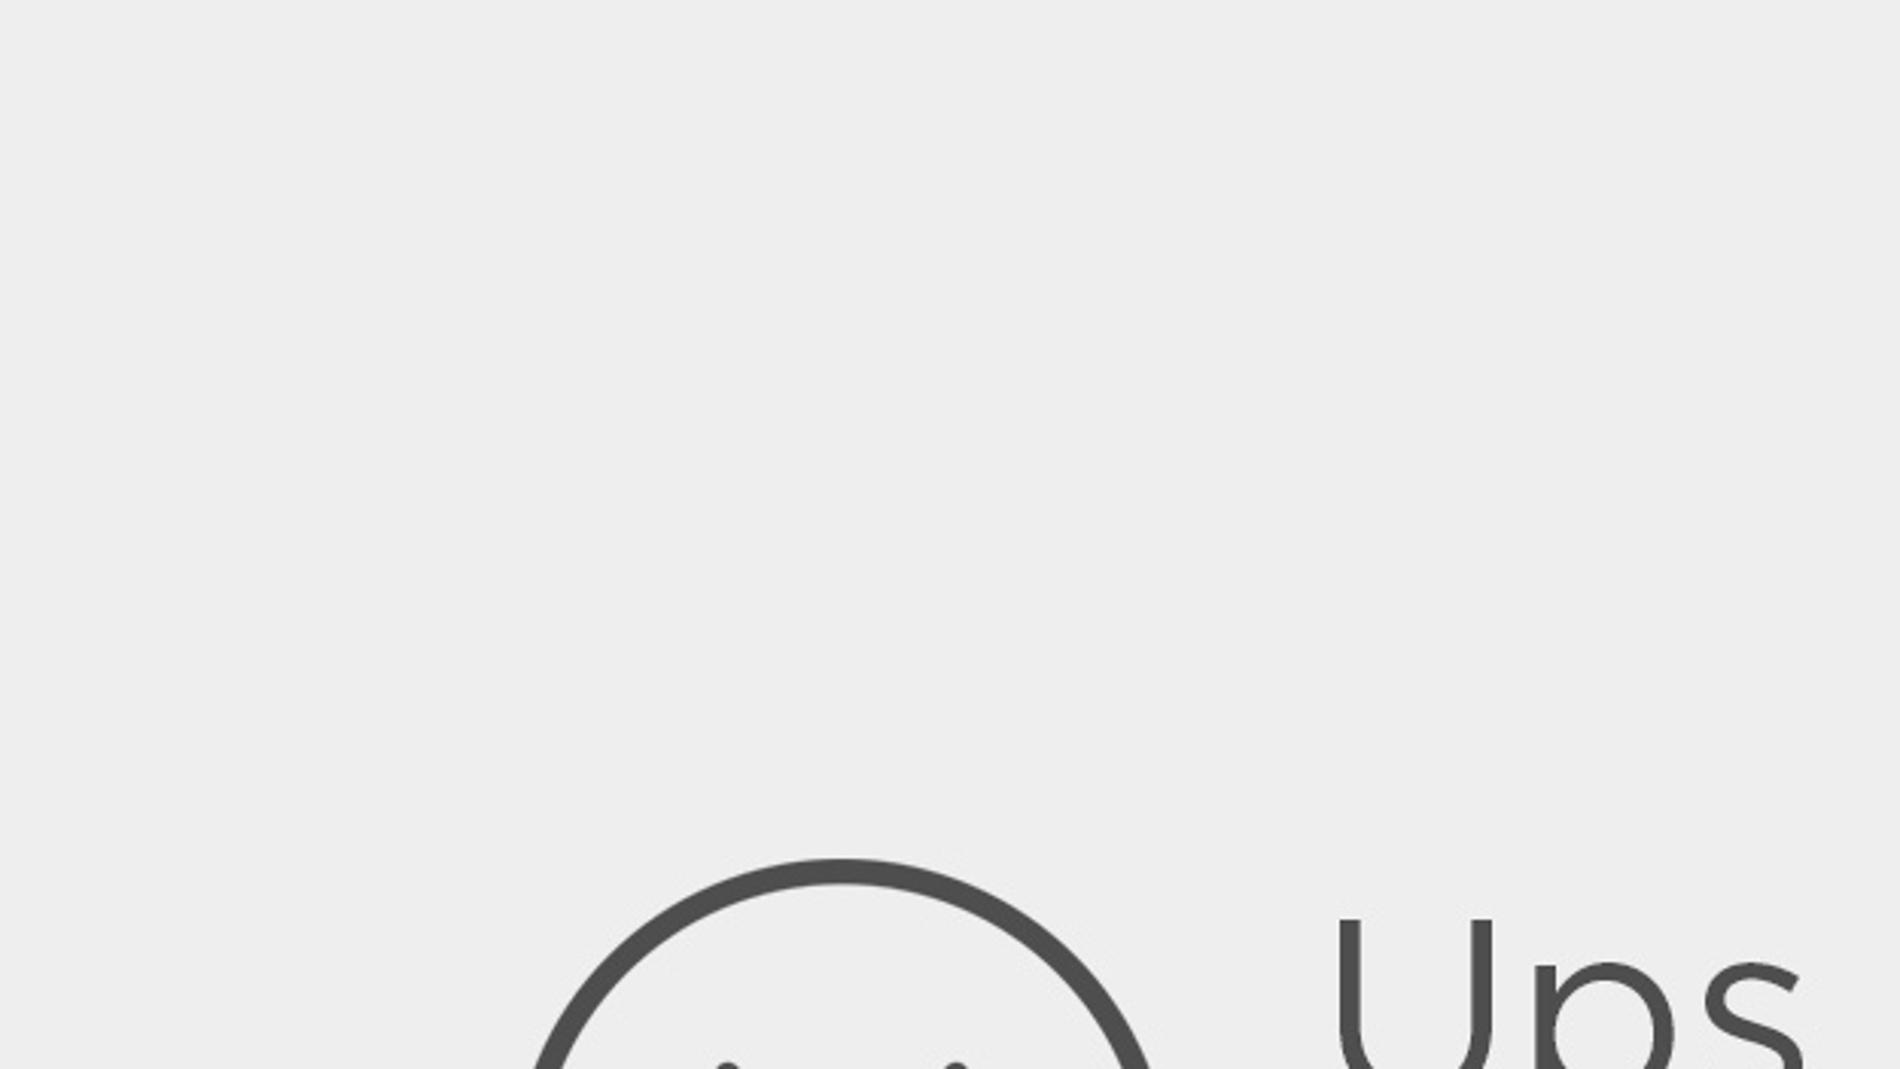 Meryl Streep, Tom Hanks,  Michael Fassbender o Jennifer Lawrence protagonizarán las posibles películas nominadas a los Oscar 2016